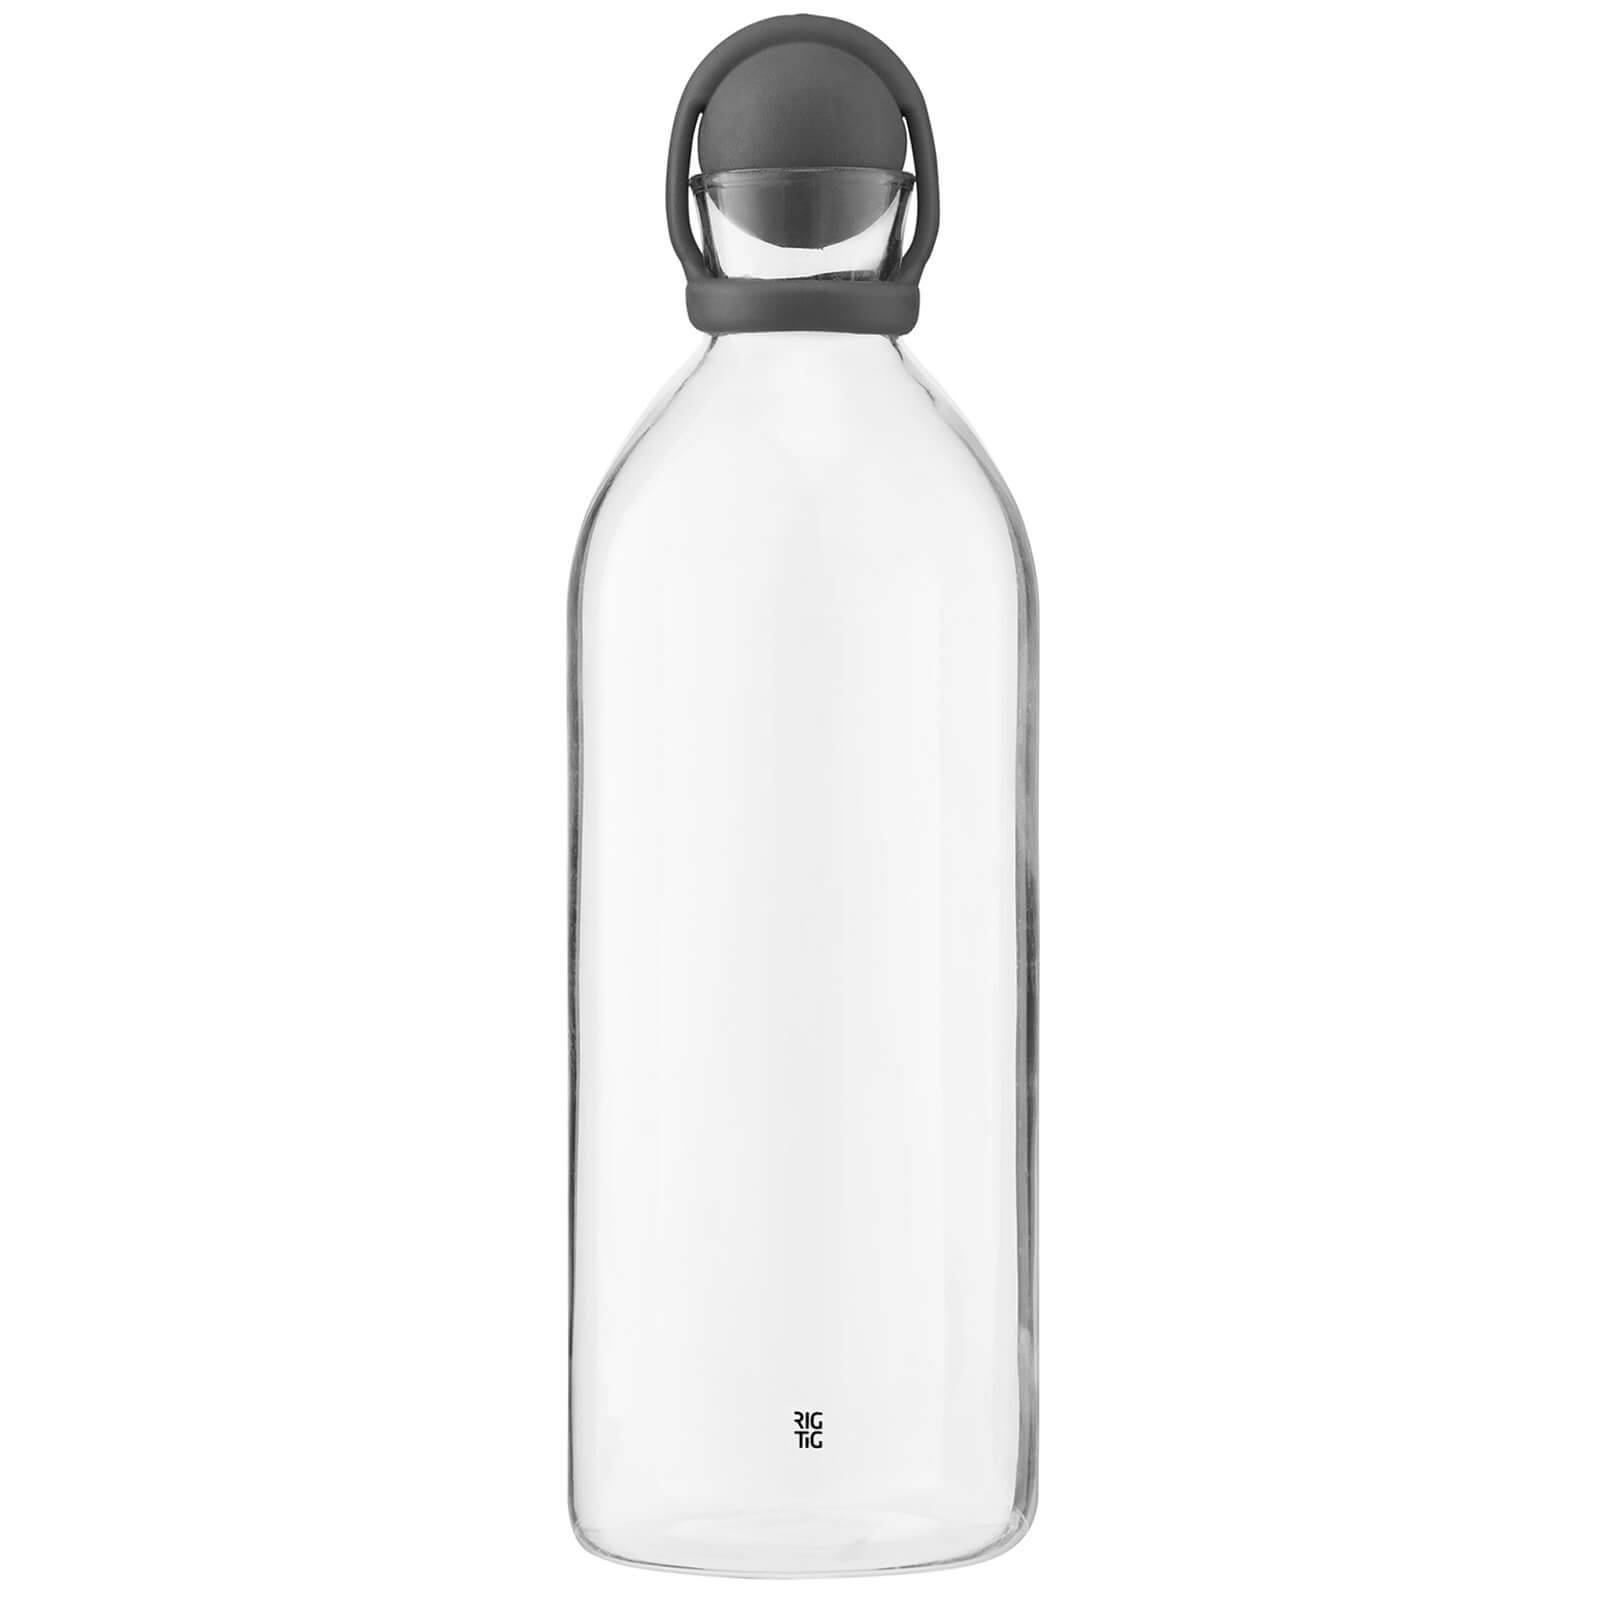 RIG-TIG Cool-It Water Carafe 0.5l - Dark Grey